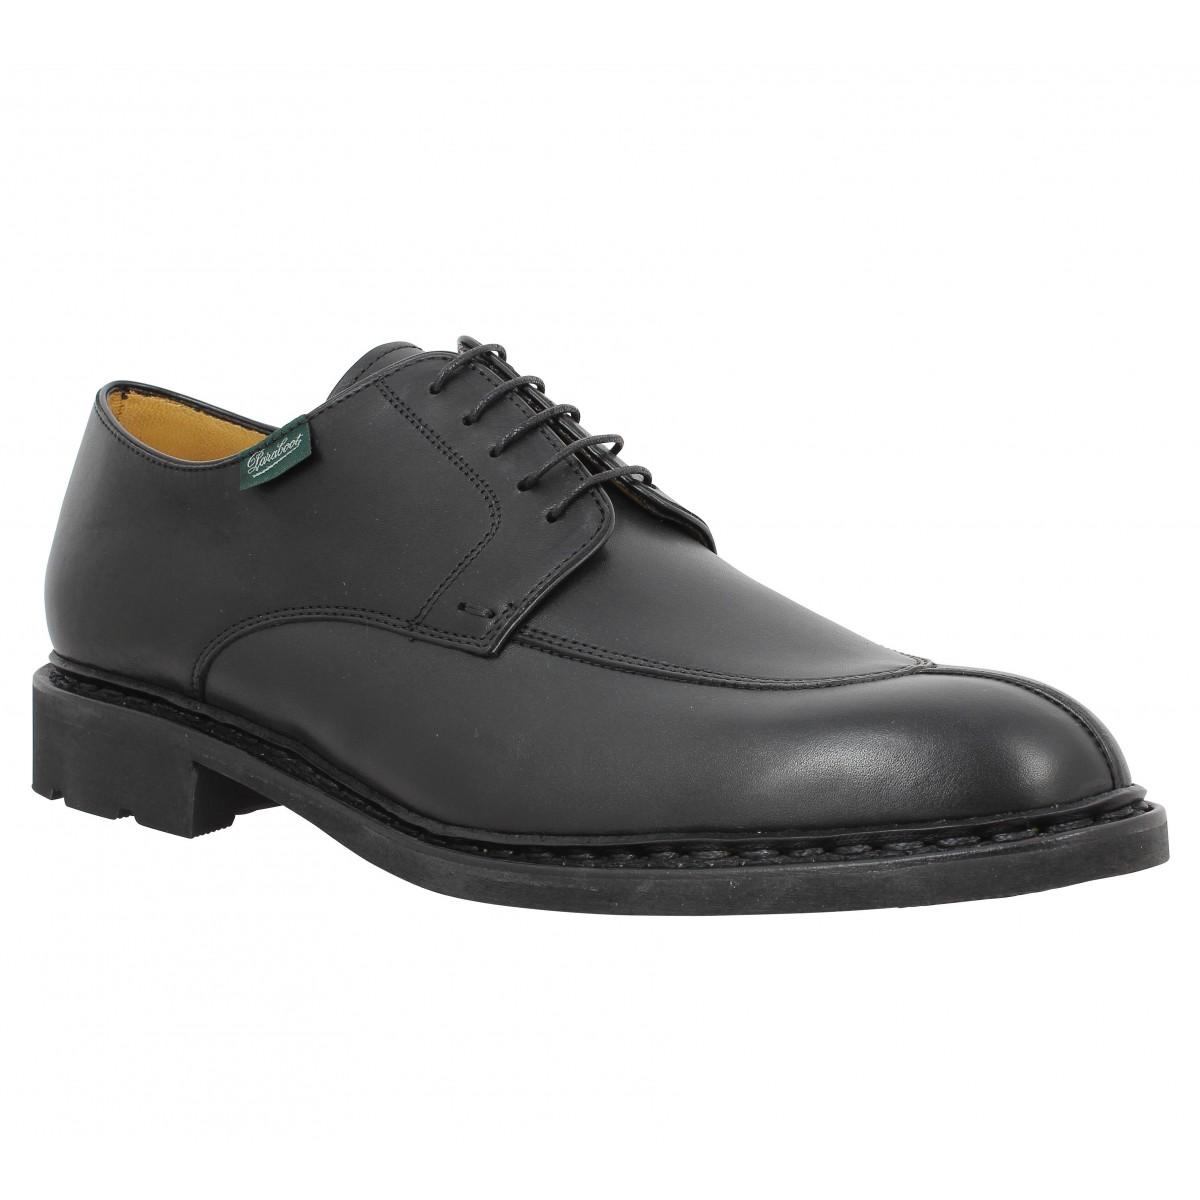 soldes paraboot tournier cuir noir homme fanny chaussures. Black Bedroom Furniture Sets. Home Design Ideas